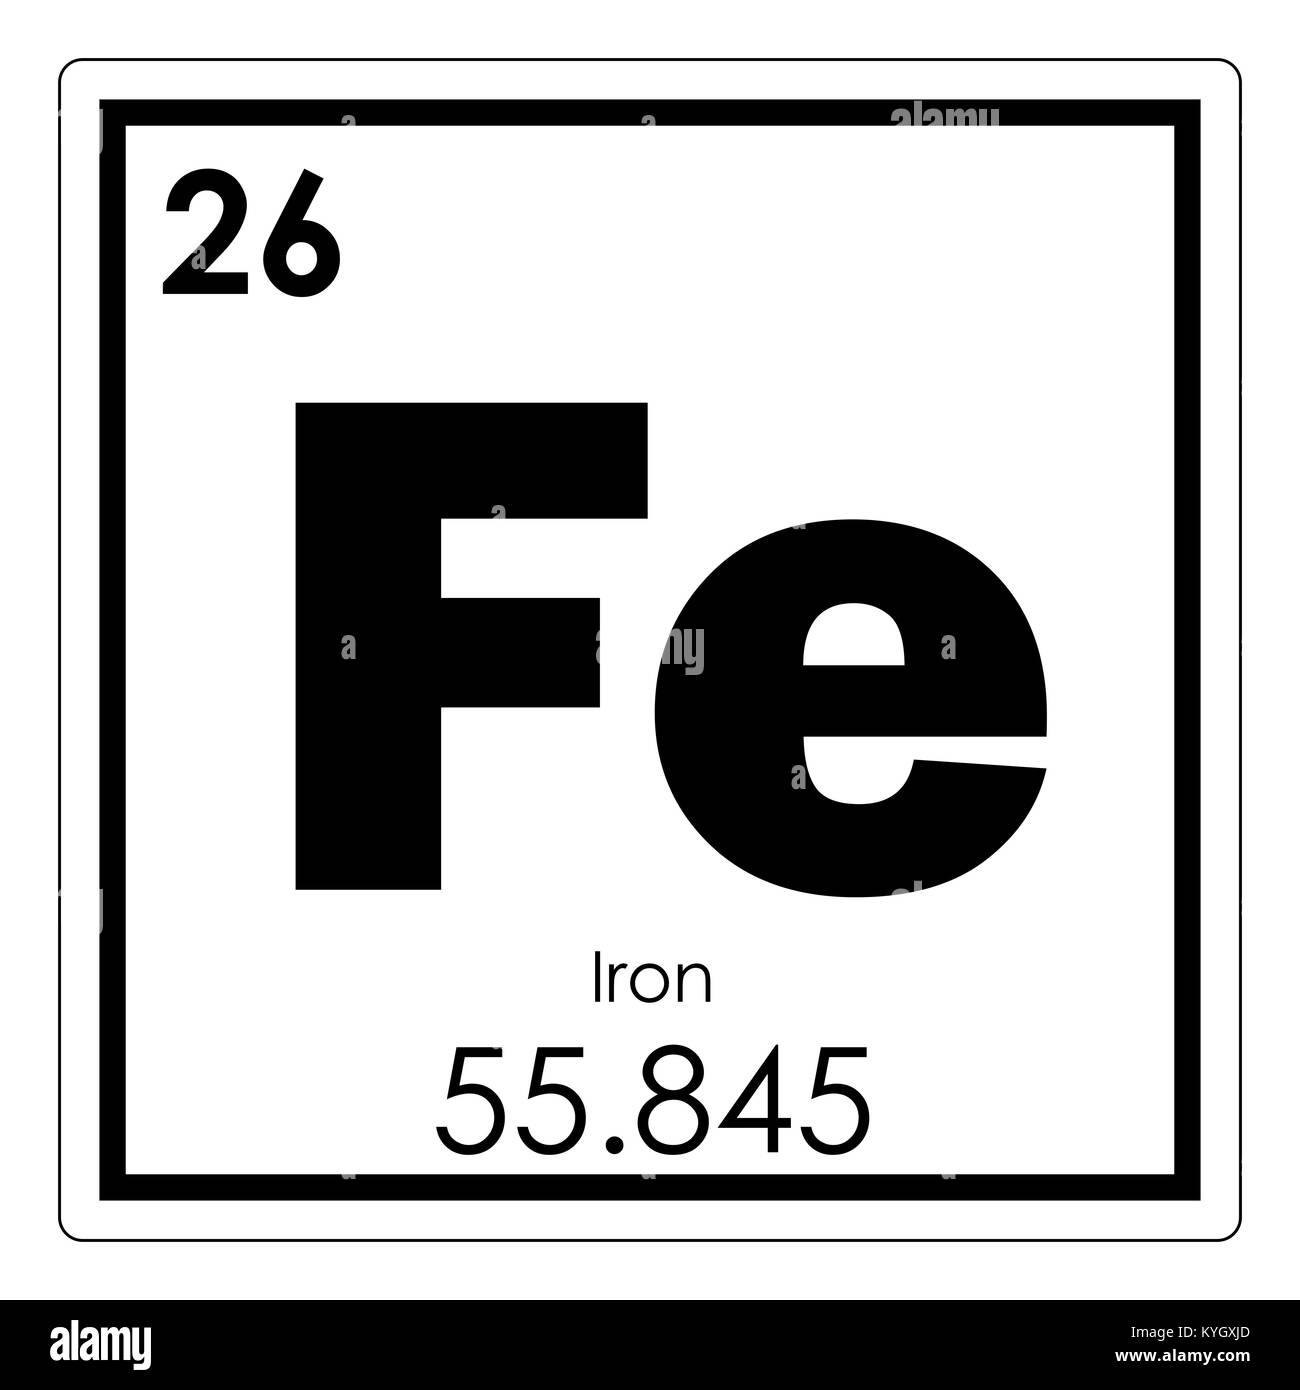 Iron chemical element stock photos iron chemical element stock iron chemical element periodic table science symbol stock image biocorpaavc